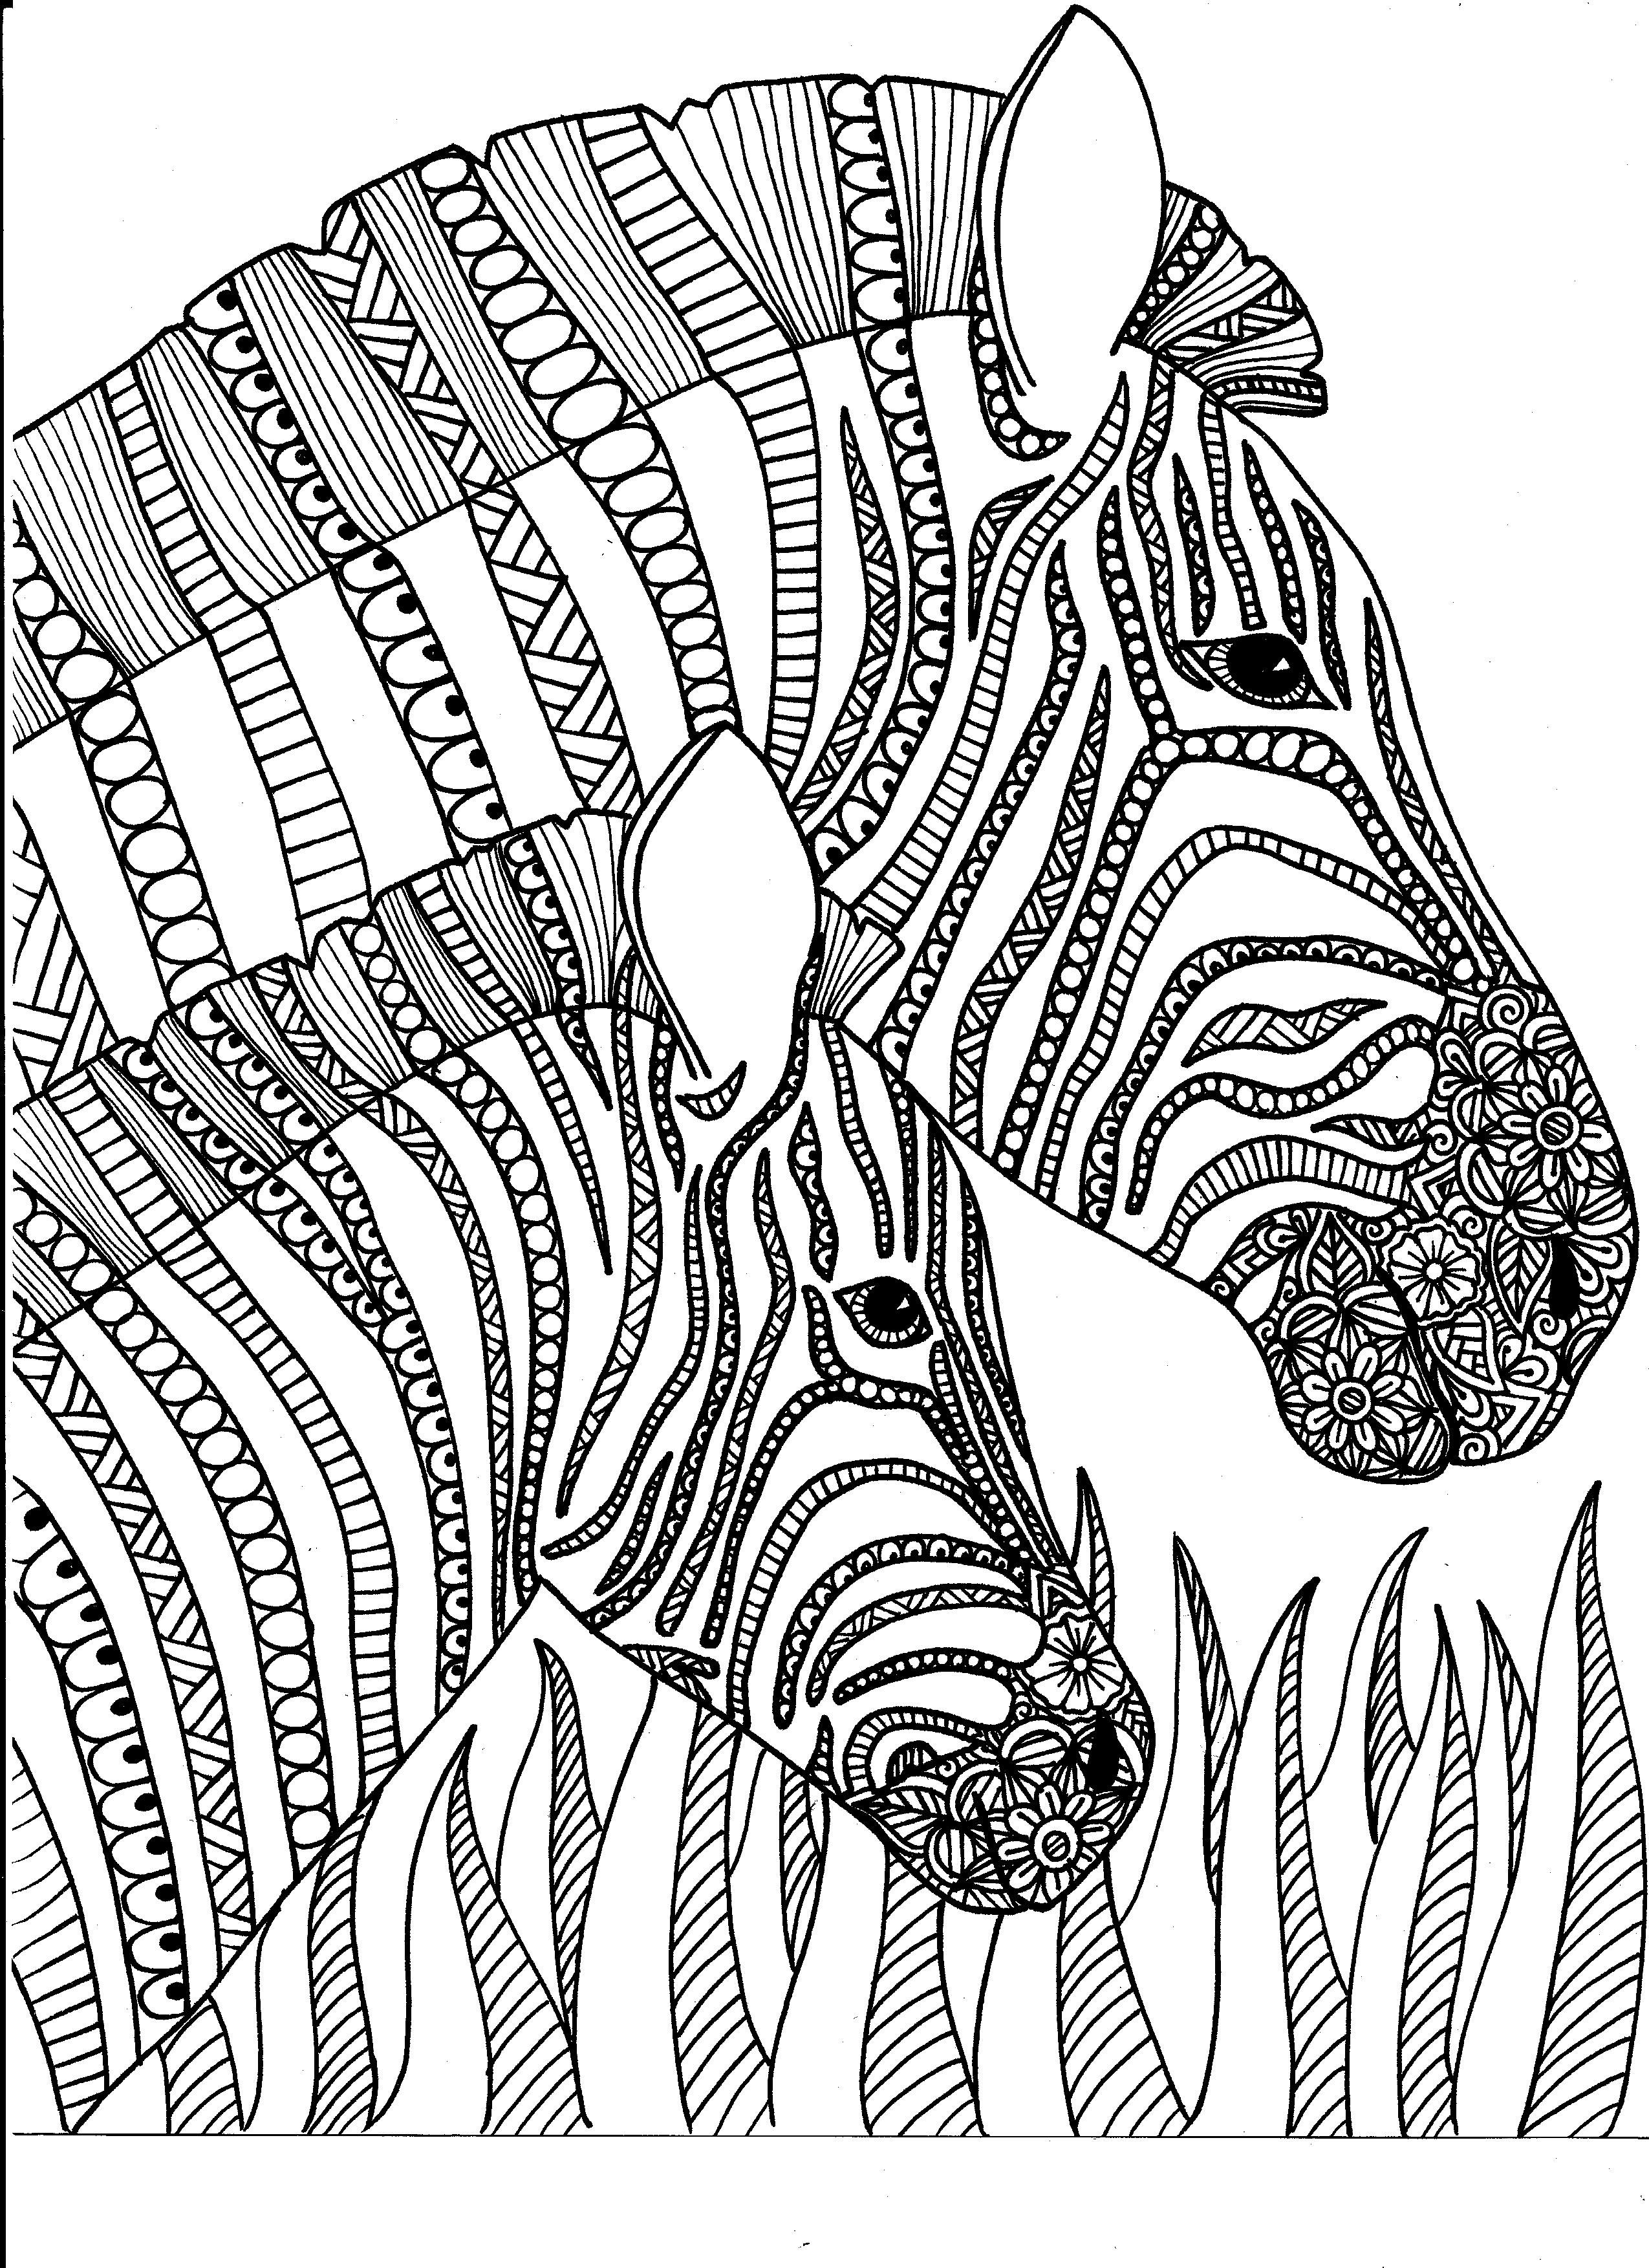 inkspirations animal kingdom coloring inkspirations animal kingdom animals color animal. Black Bedroom Furniture Sets. Home Design Ideas